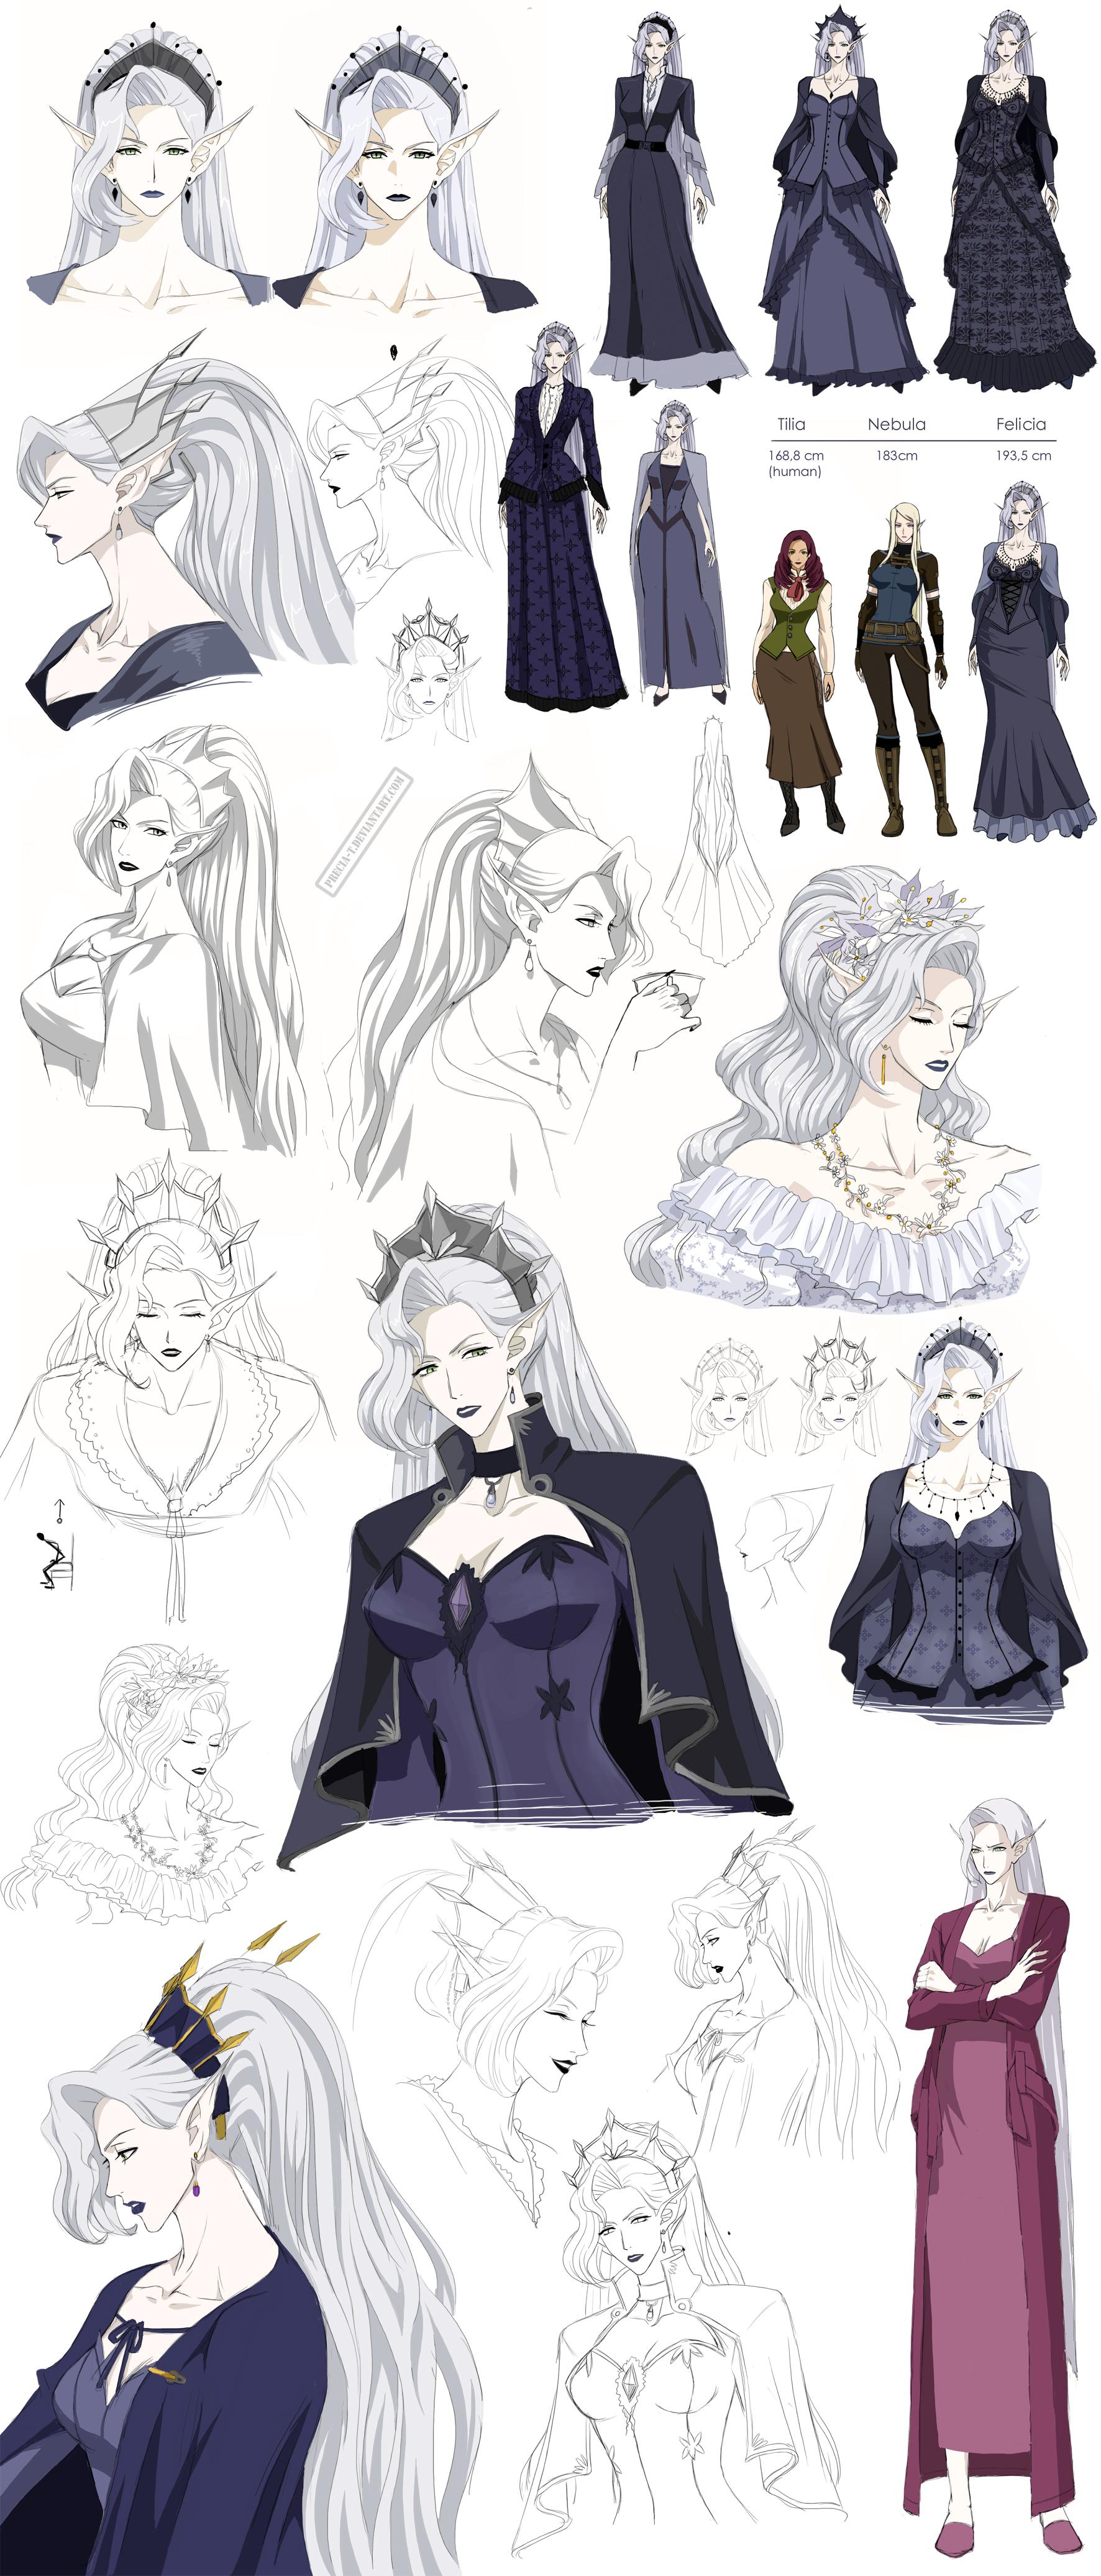 Felicia casual design (TARGA) by Precia-T